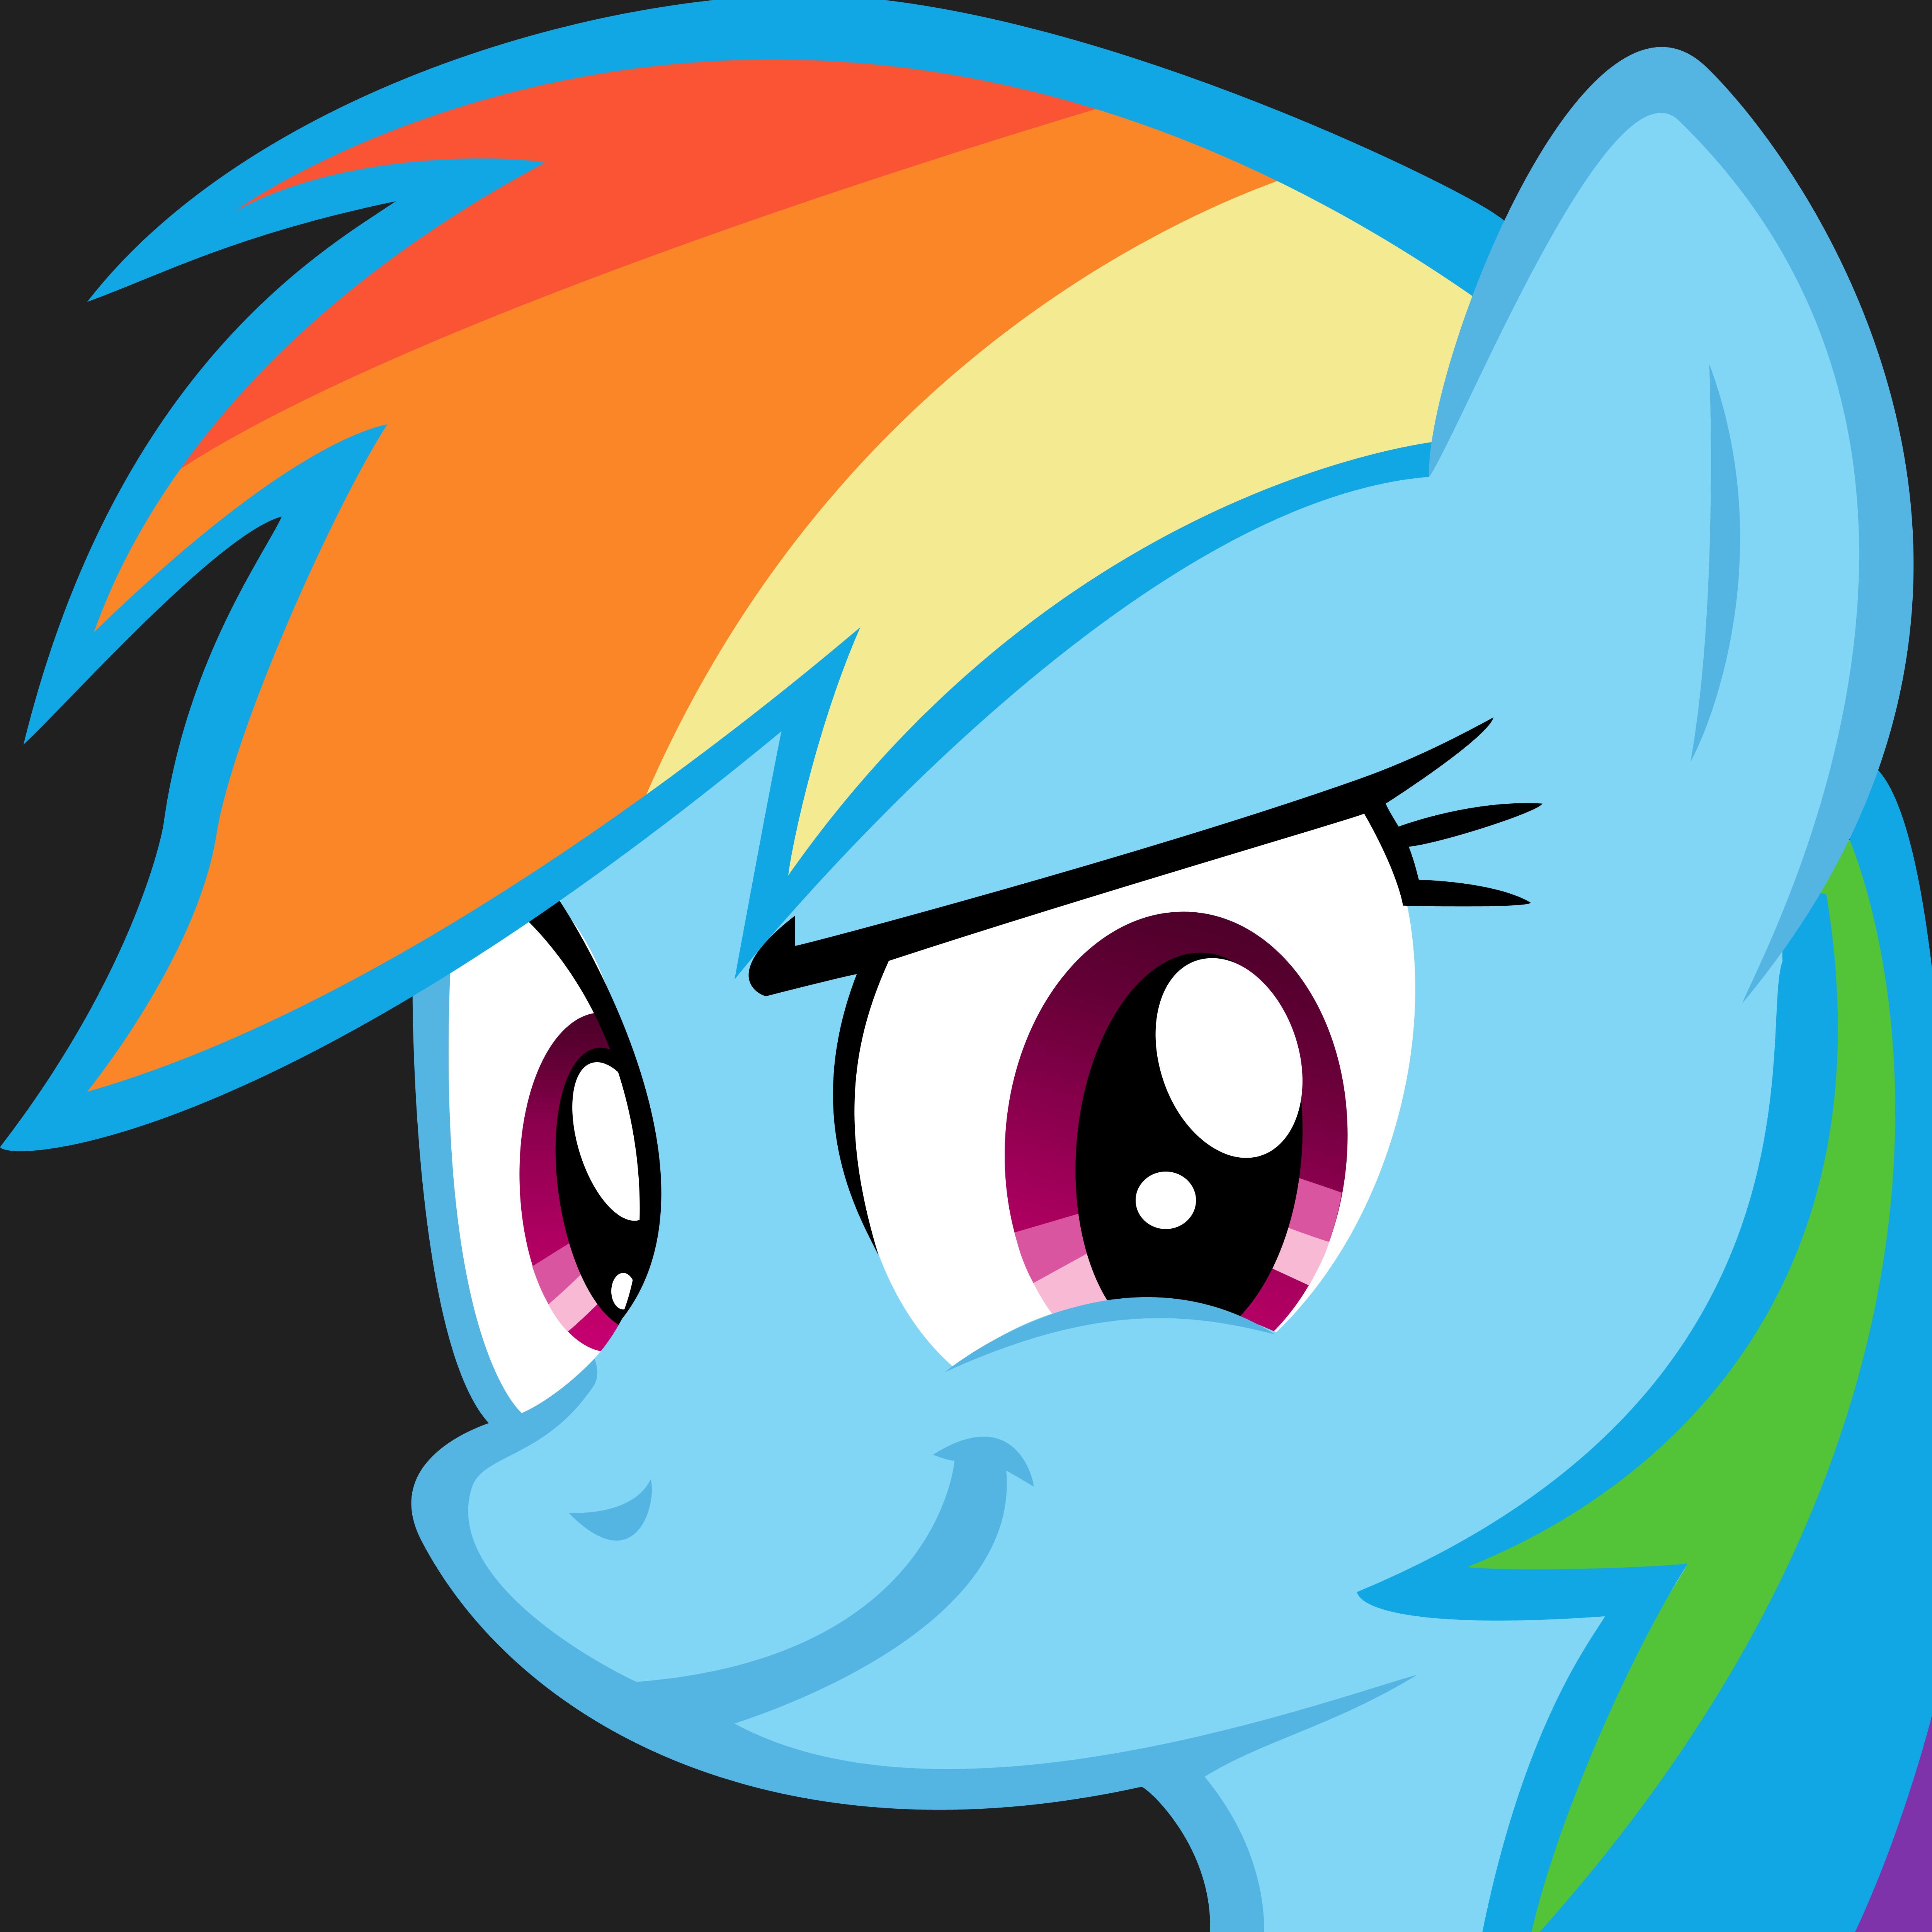 Oh yeah Rainbow Dash by danspy1994 on DeviantArt | 5000 x 5000 png 644kB